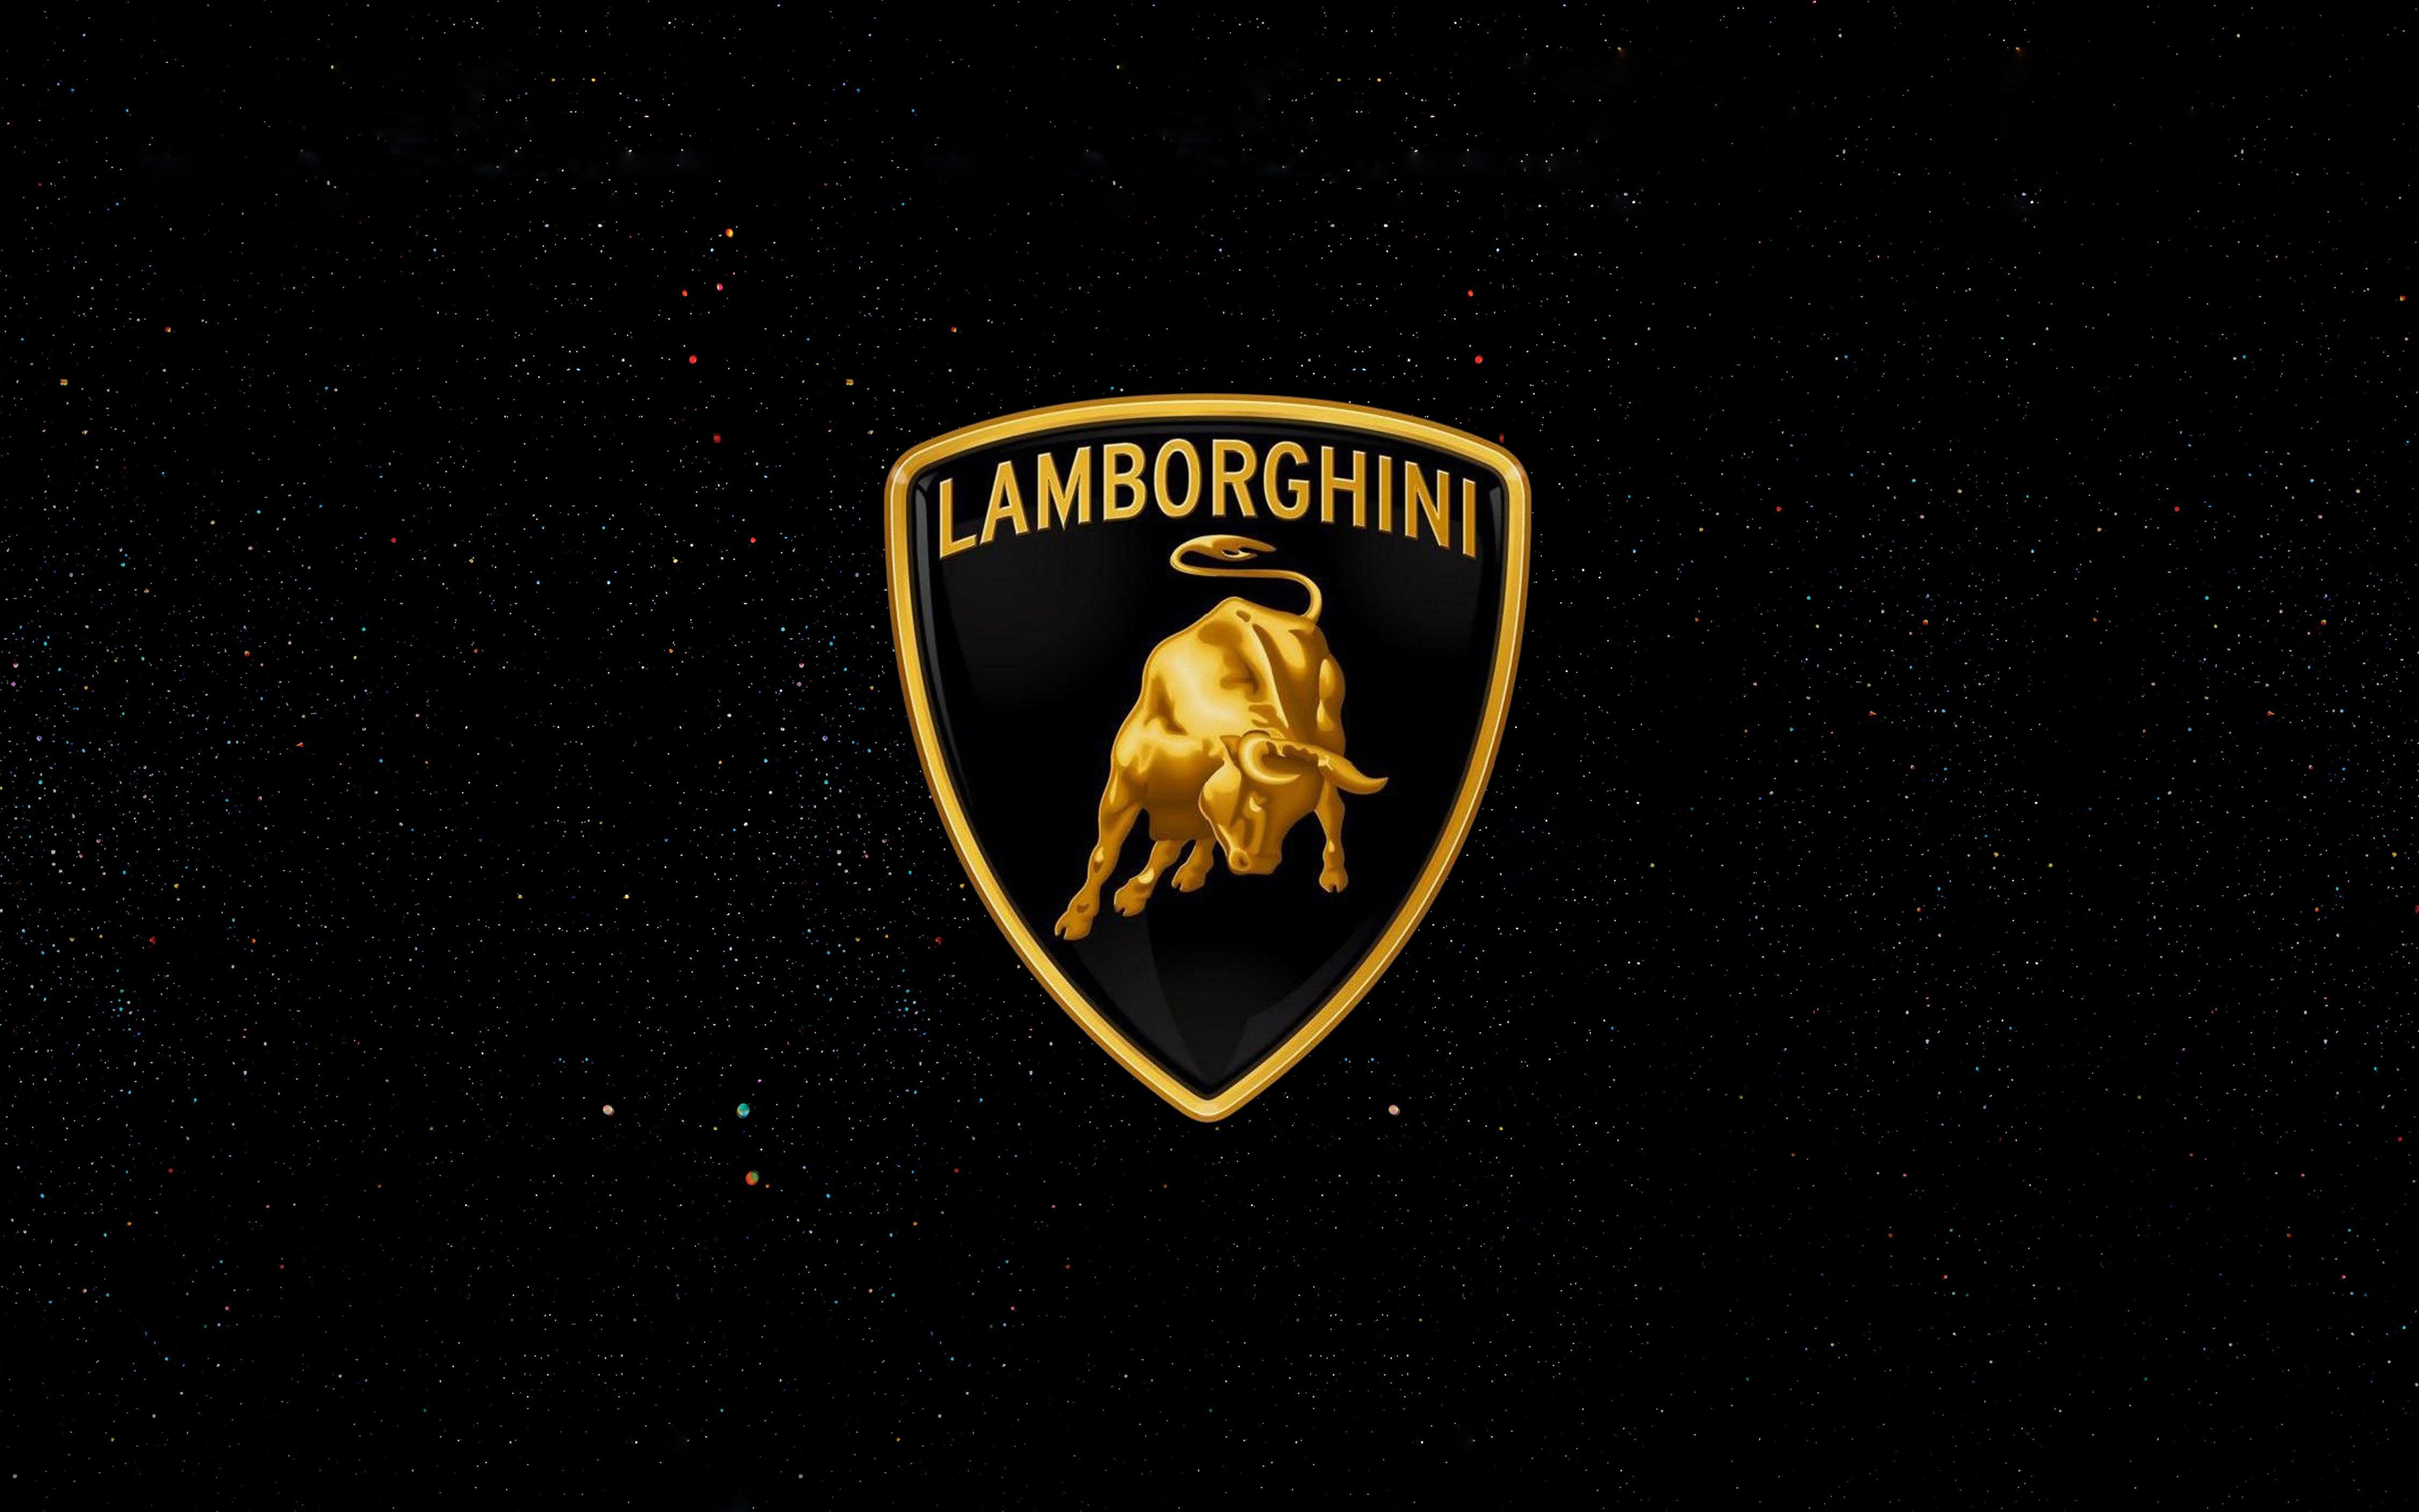 Lambo Logo Wallpapers   Top Lambo Logo Backgrounds 4500x2813